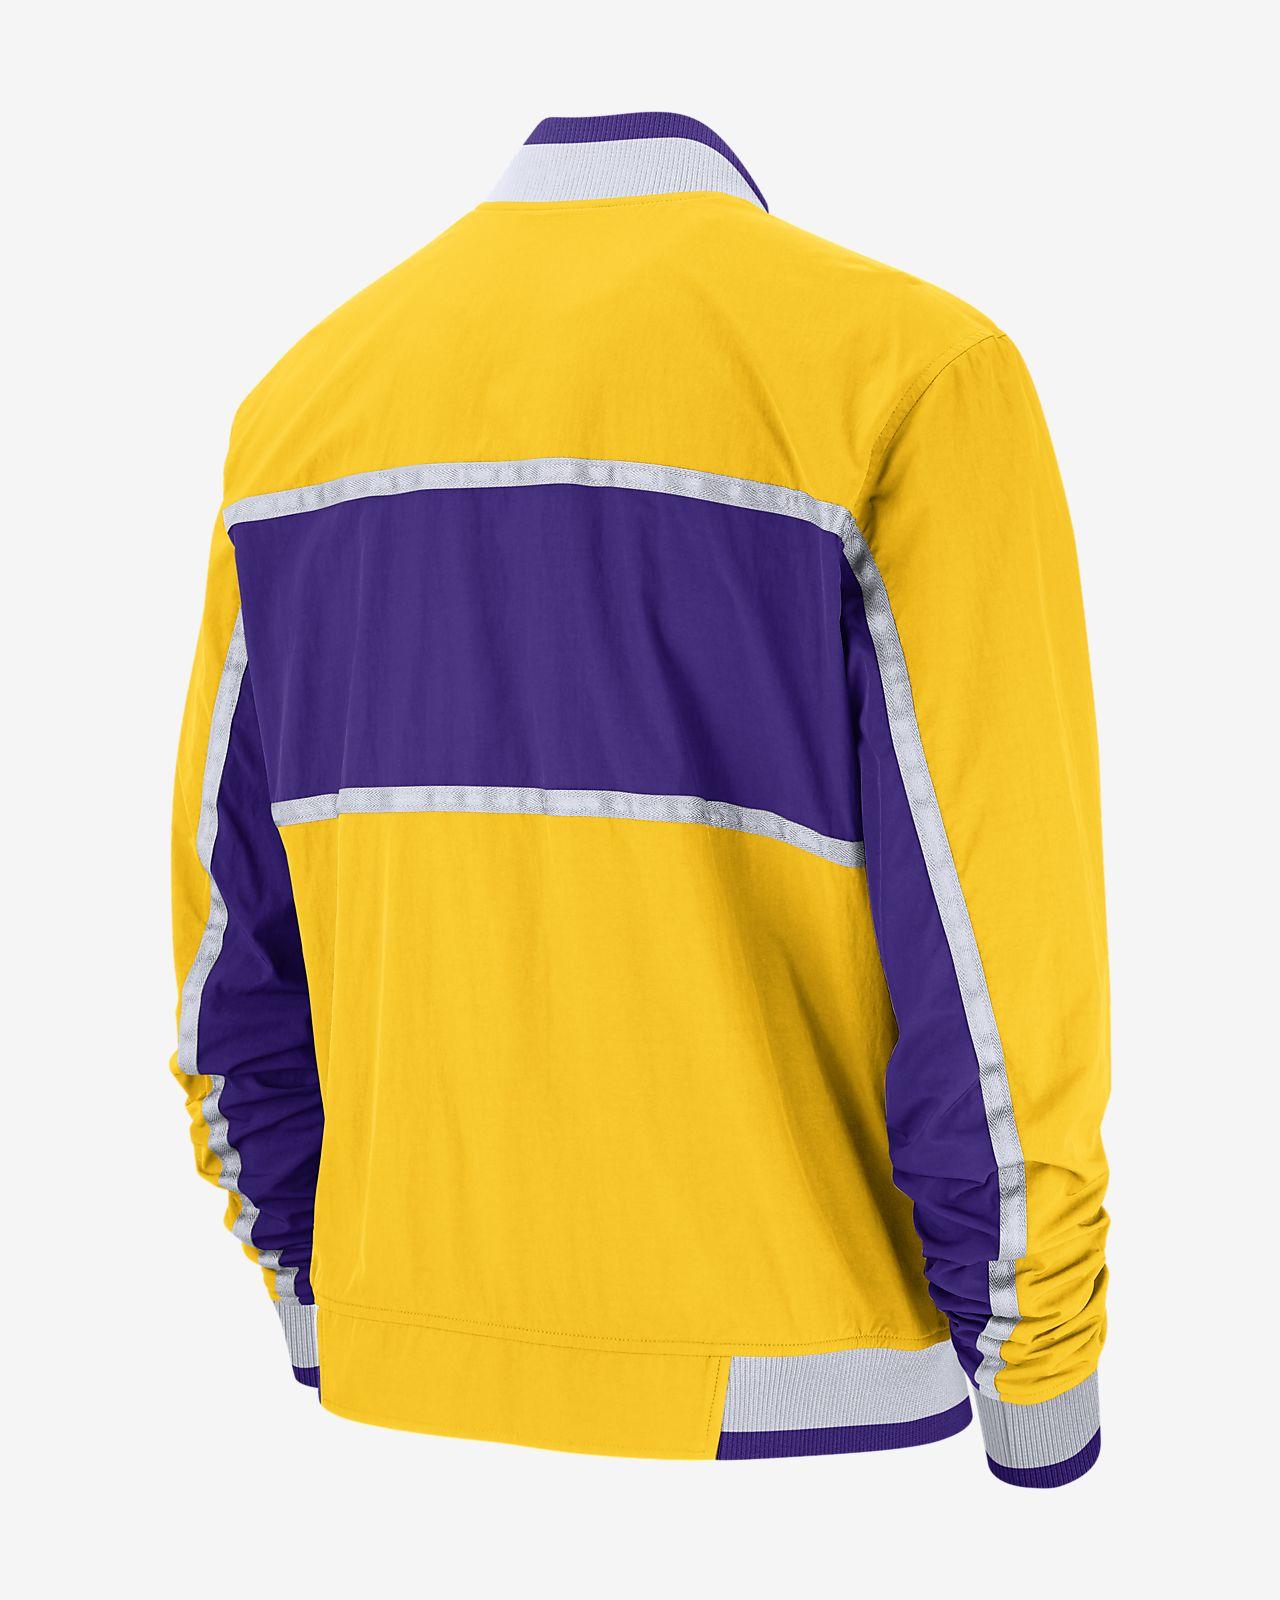 9cb251b1e943 Los Angeles Lakers Nike Courtside Men s NBA Jacket. Nike.com CA